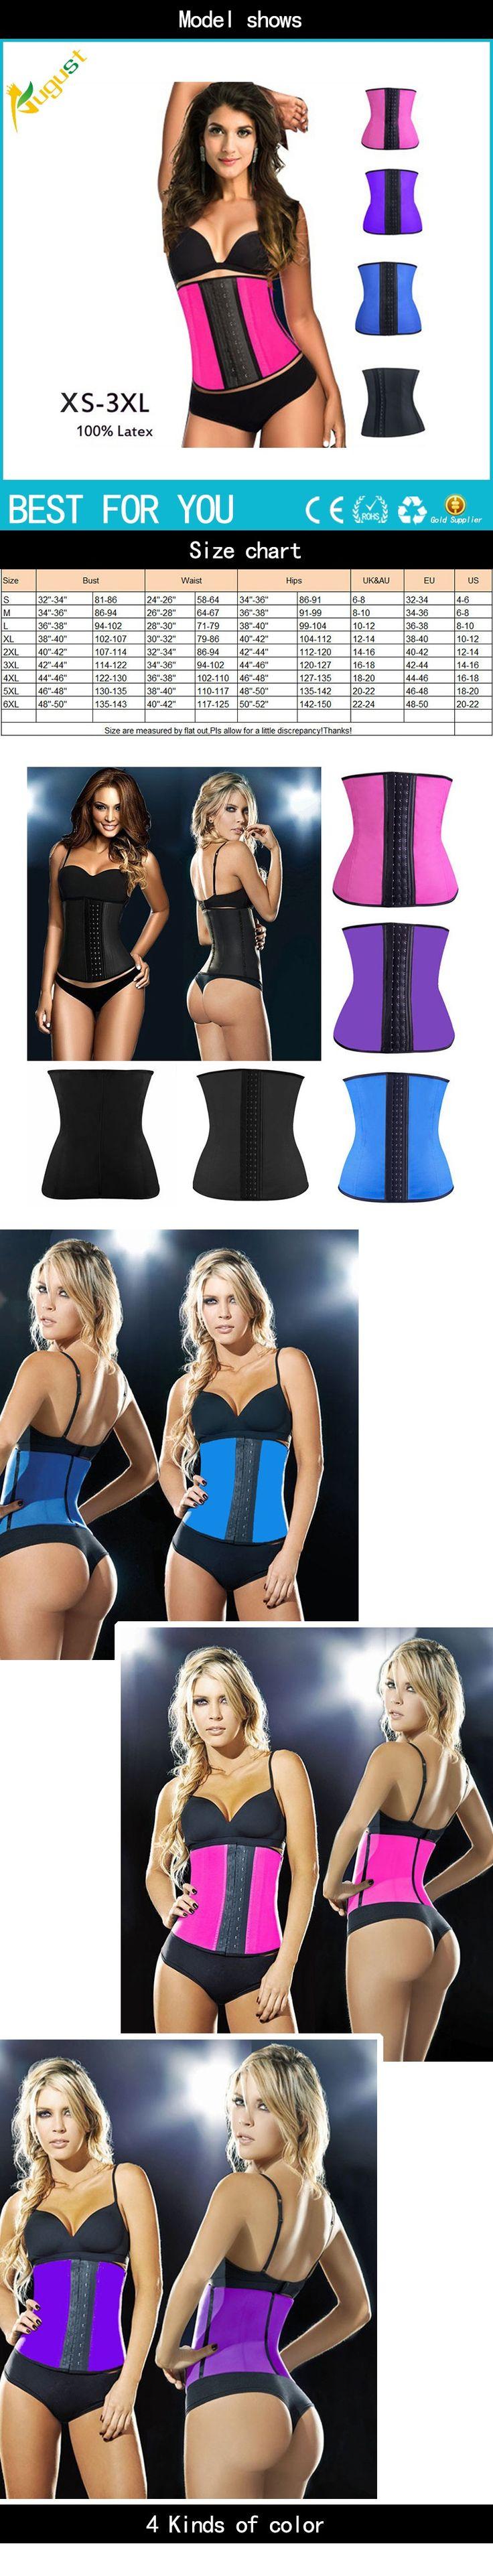 Latex corset body waist trainer corsets 100% Latex Corset Sexy Women Latex Waist 9 Steel Bones Shapewear – clothesgroup.net